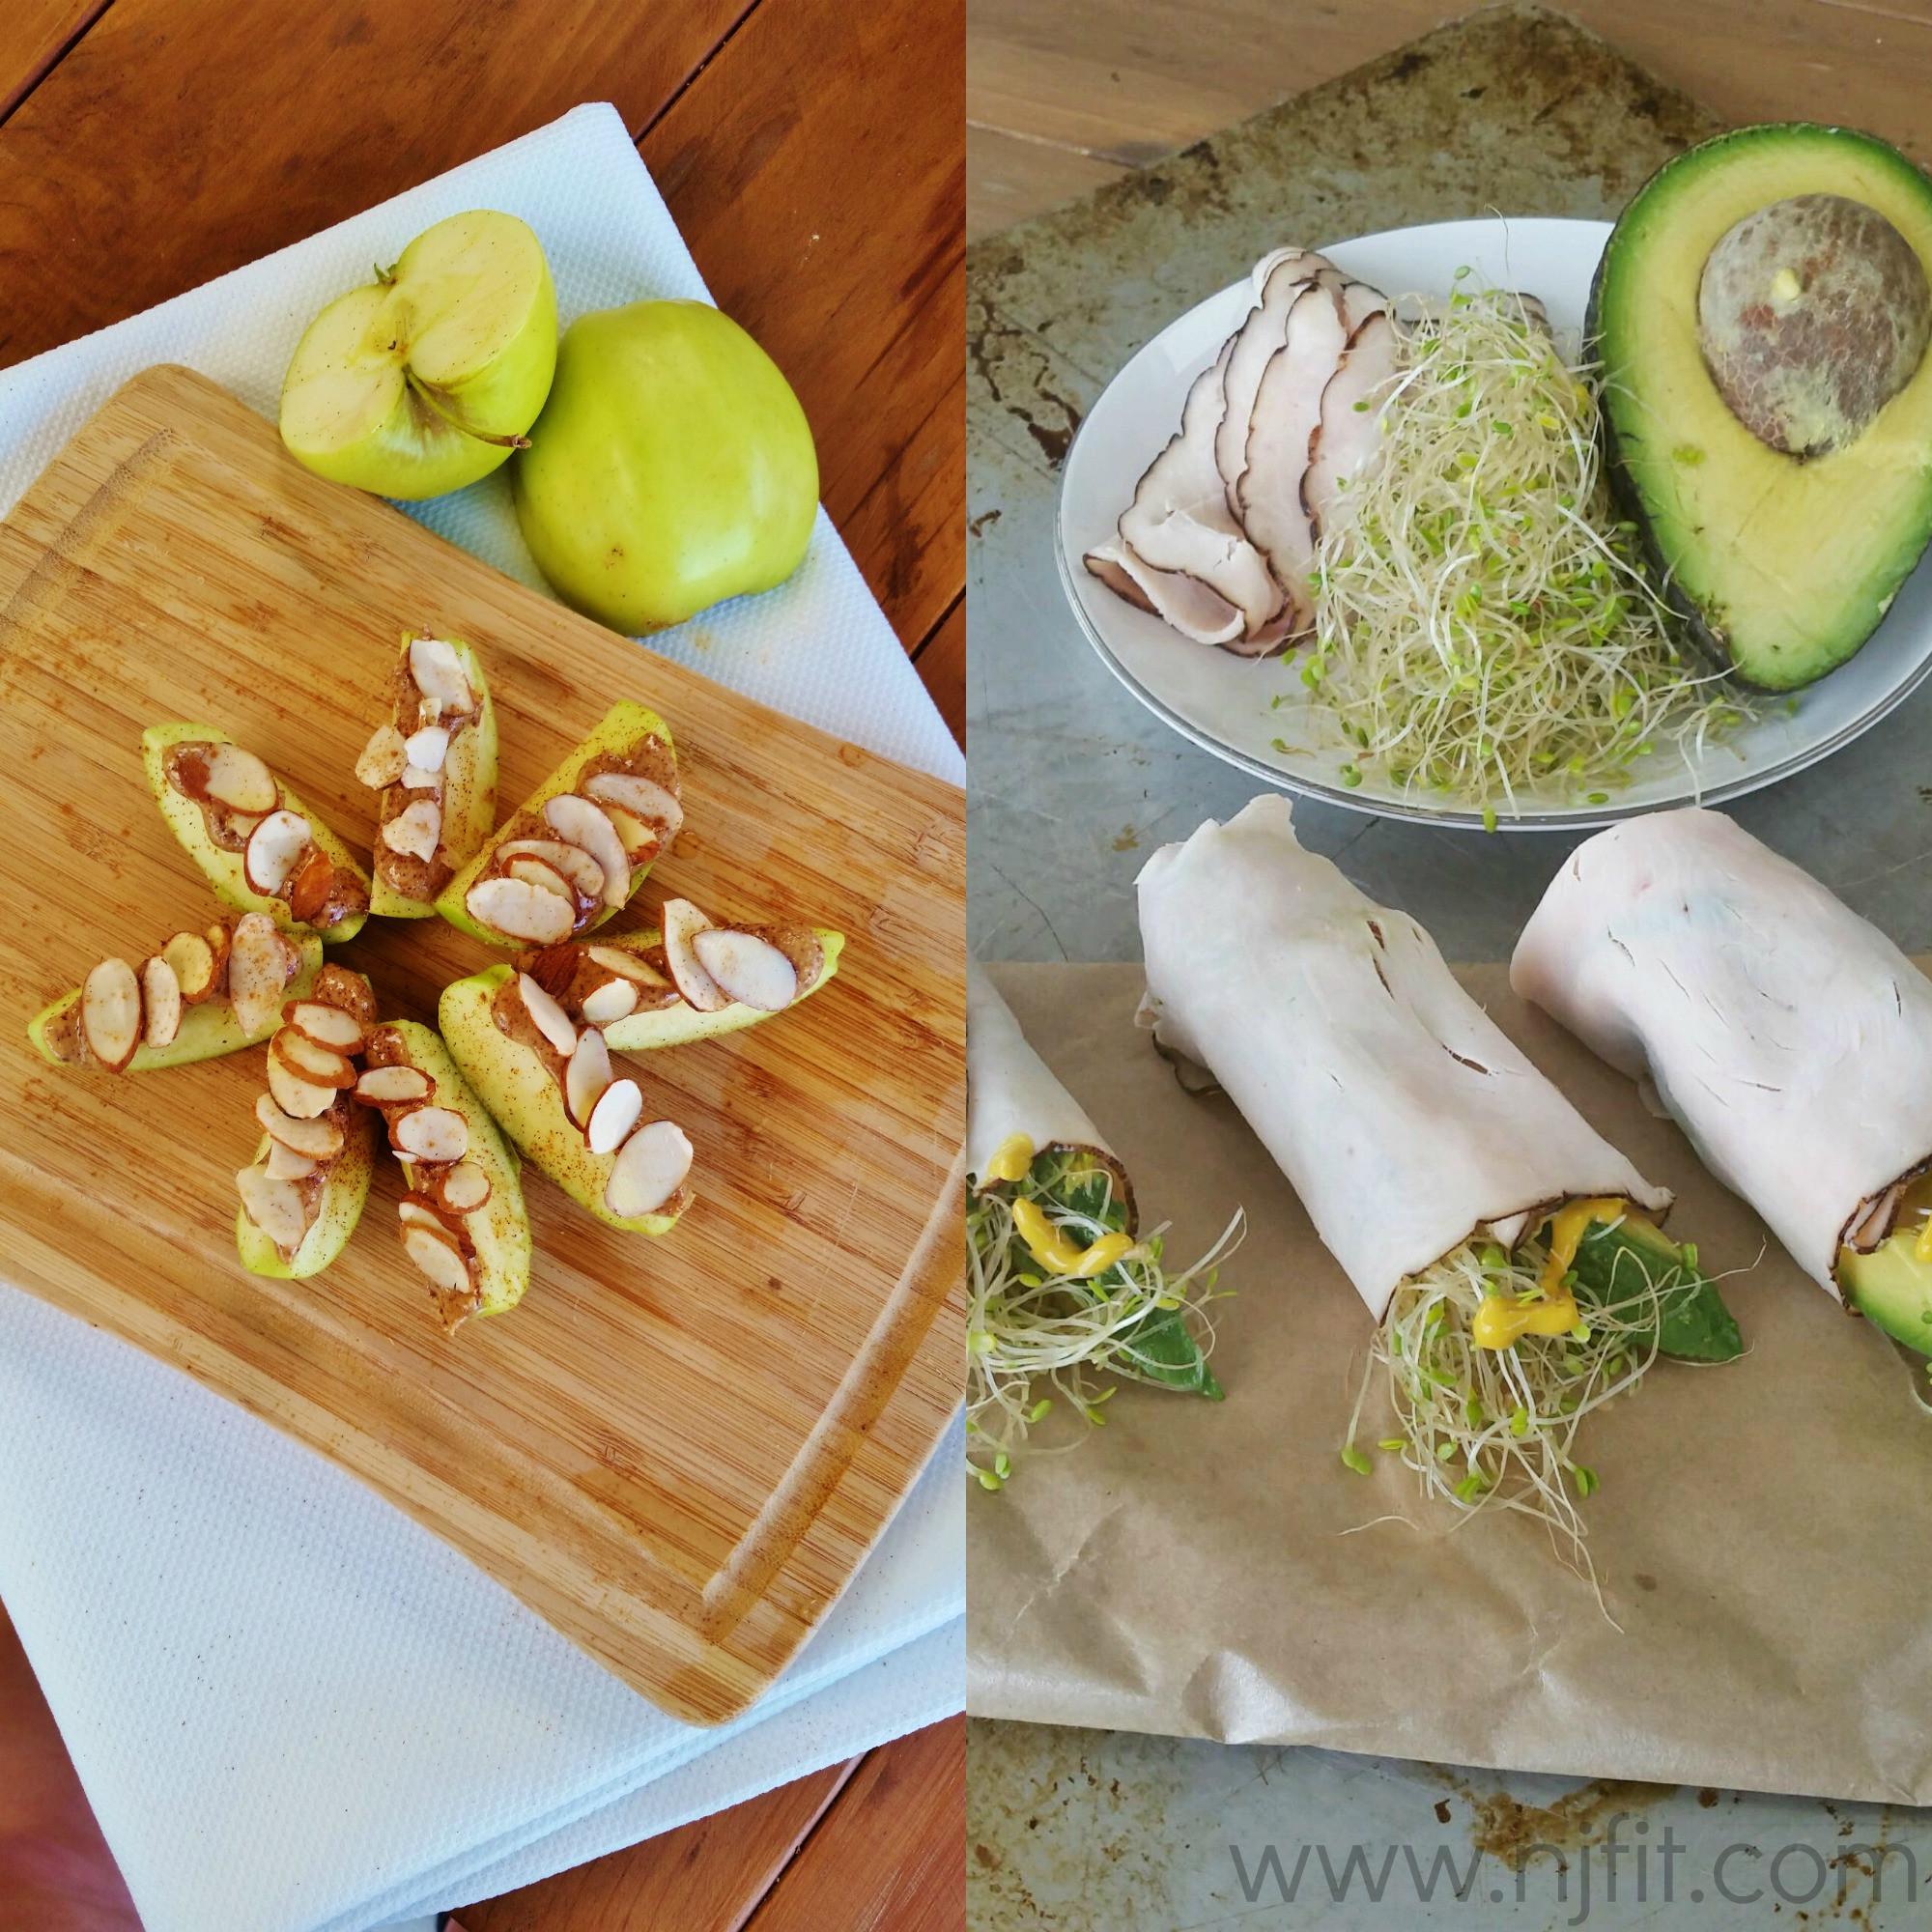 Healthy Supermarket Snacks  Quick healthy snacks 2 Natalie Jill Fitness